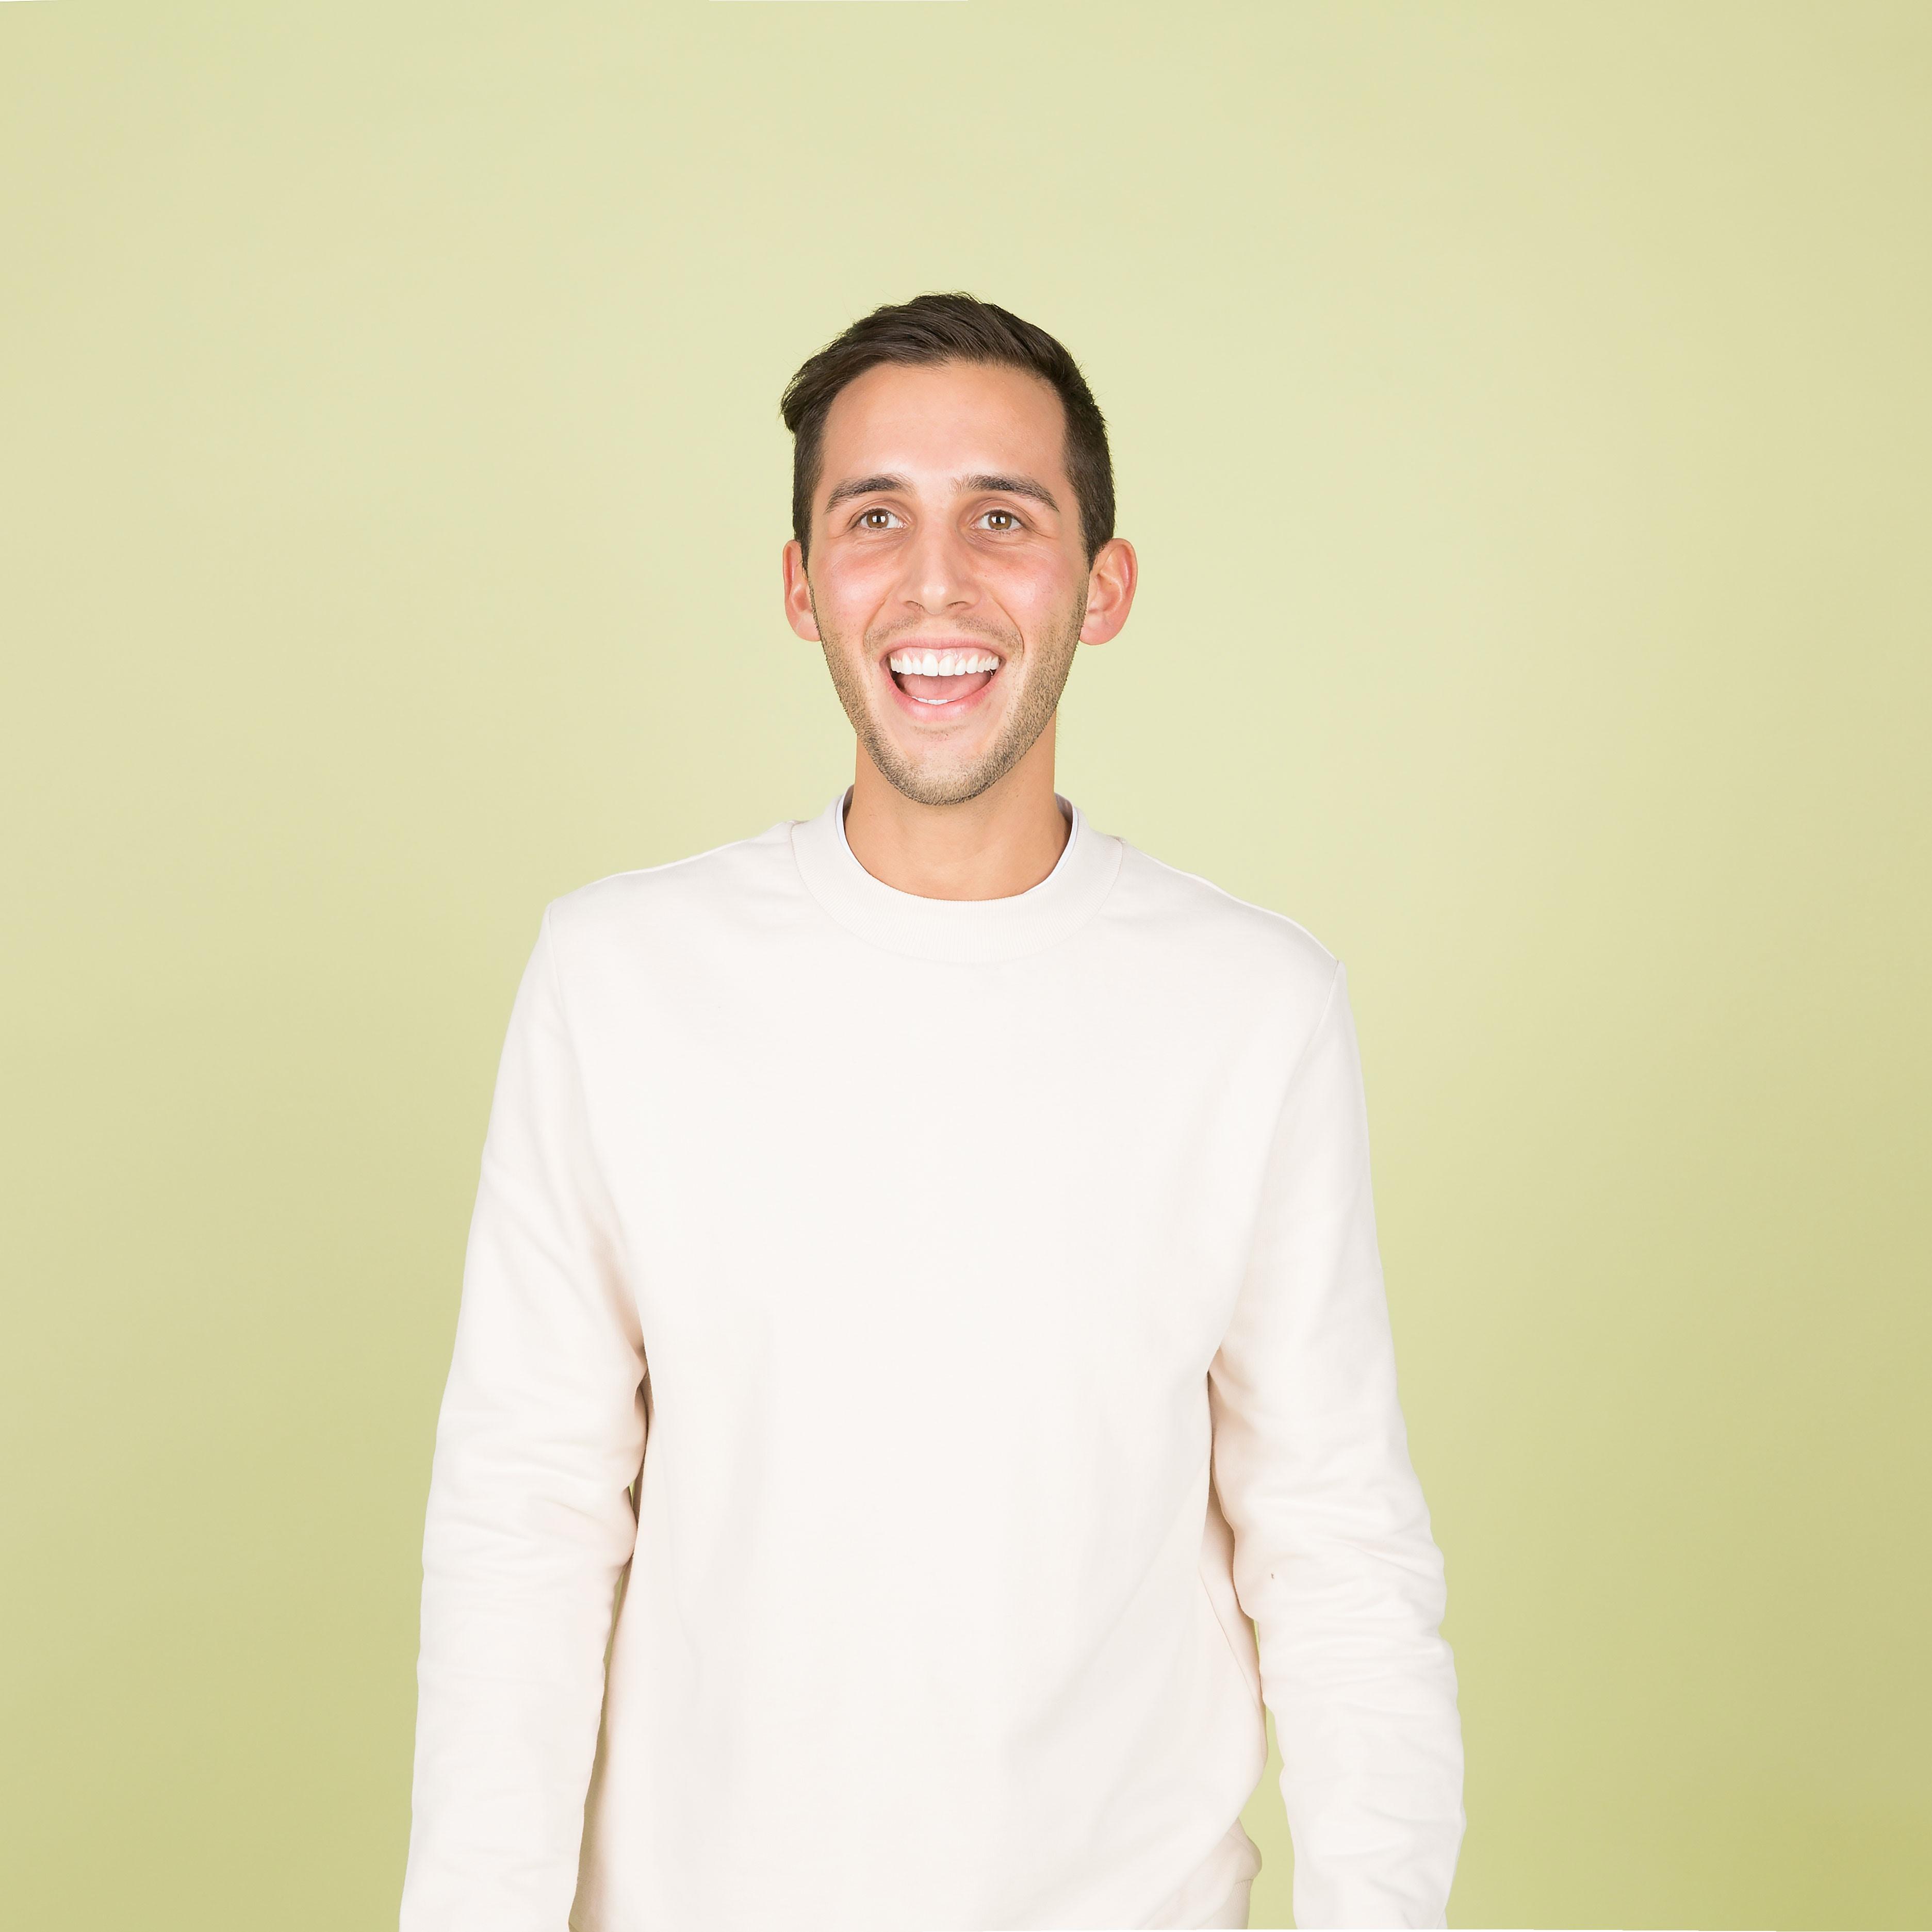 man wearing white crew-neck long-sleeved shirt standing inside well lighted room